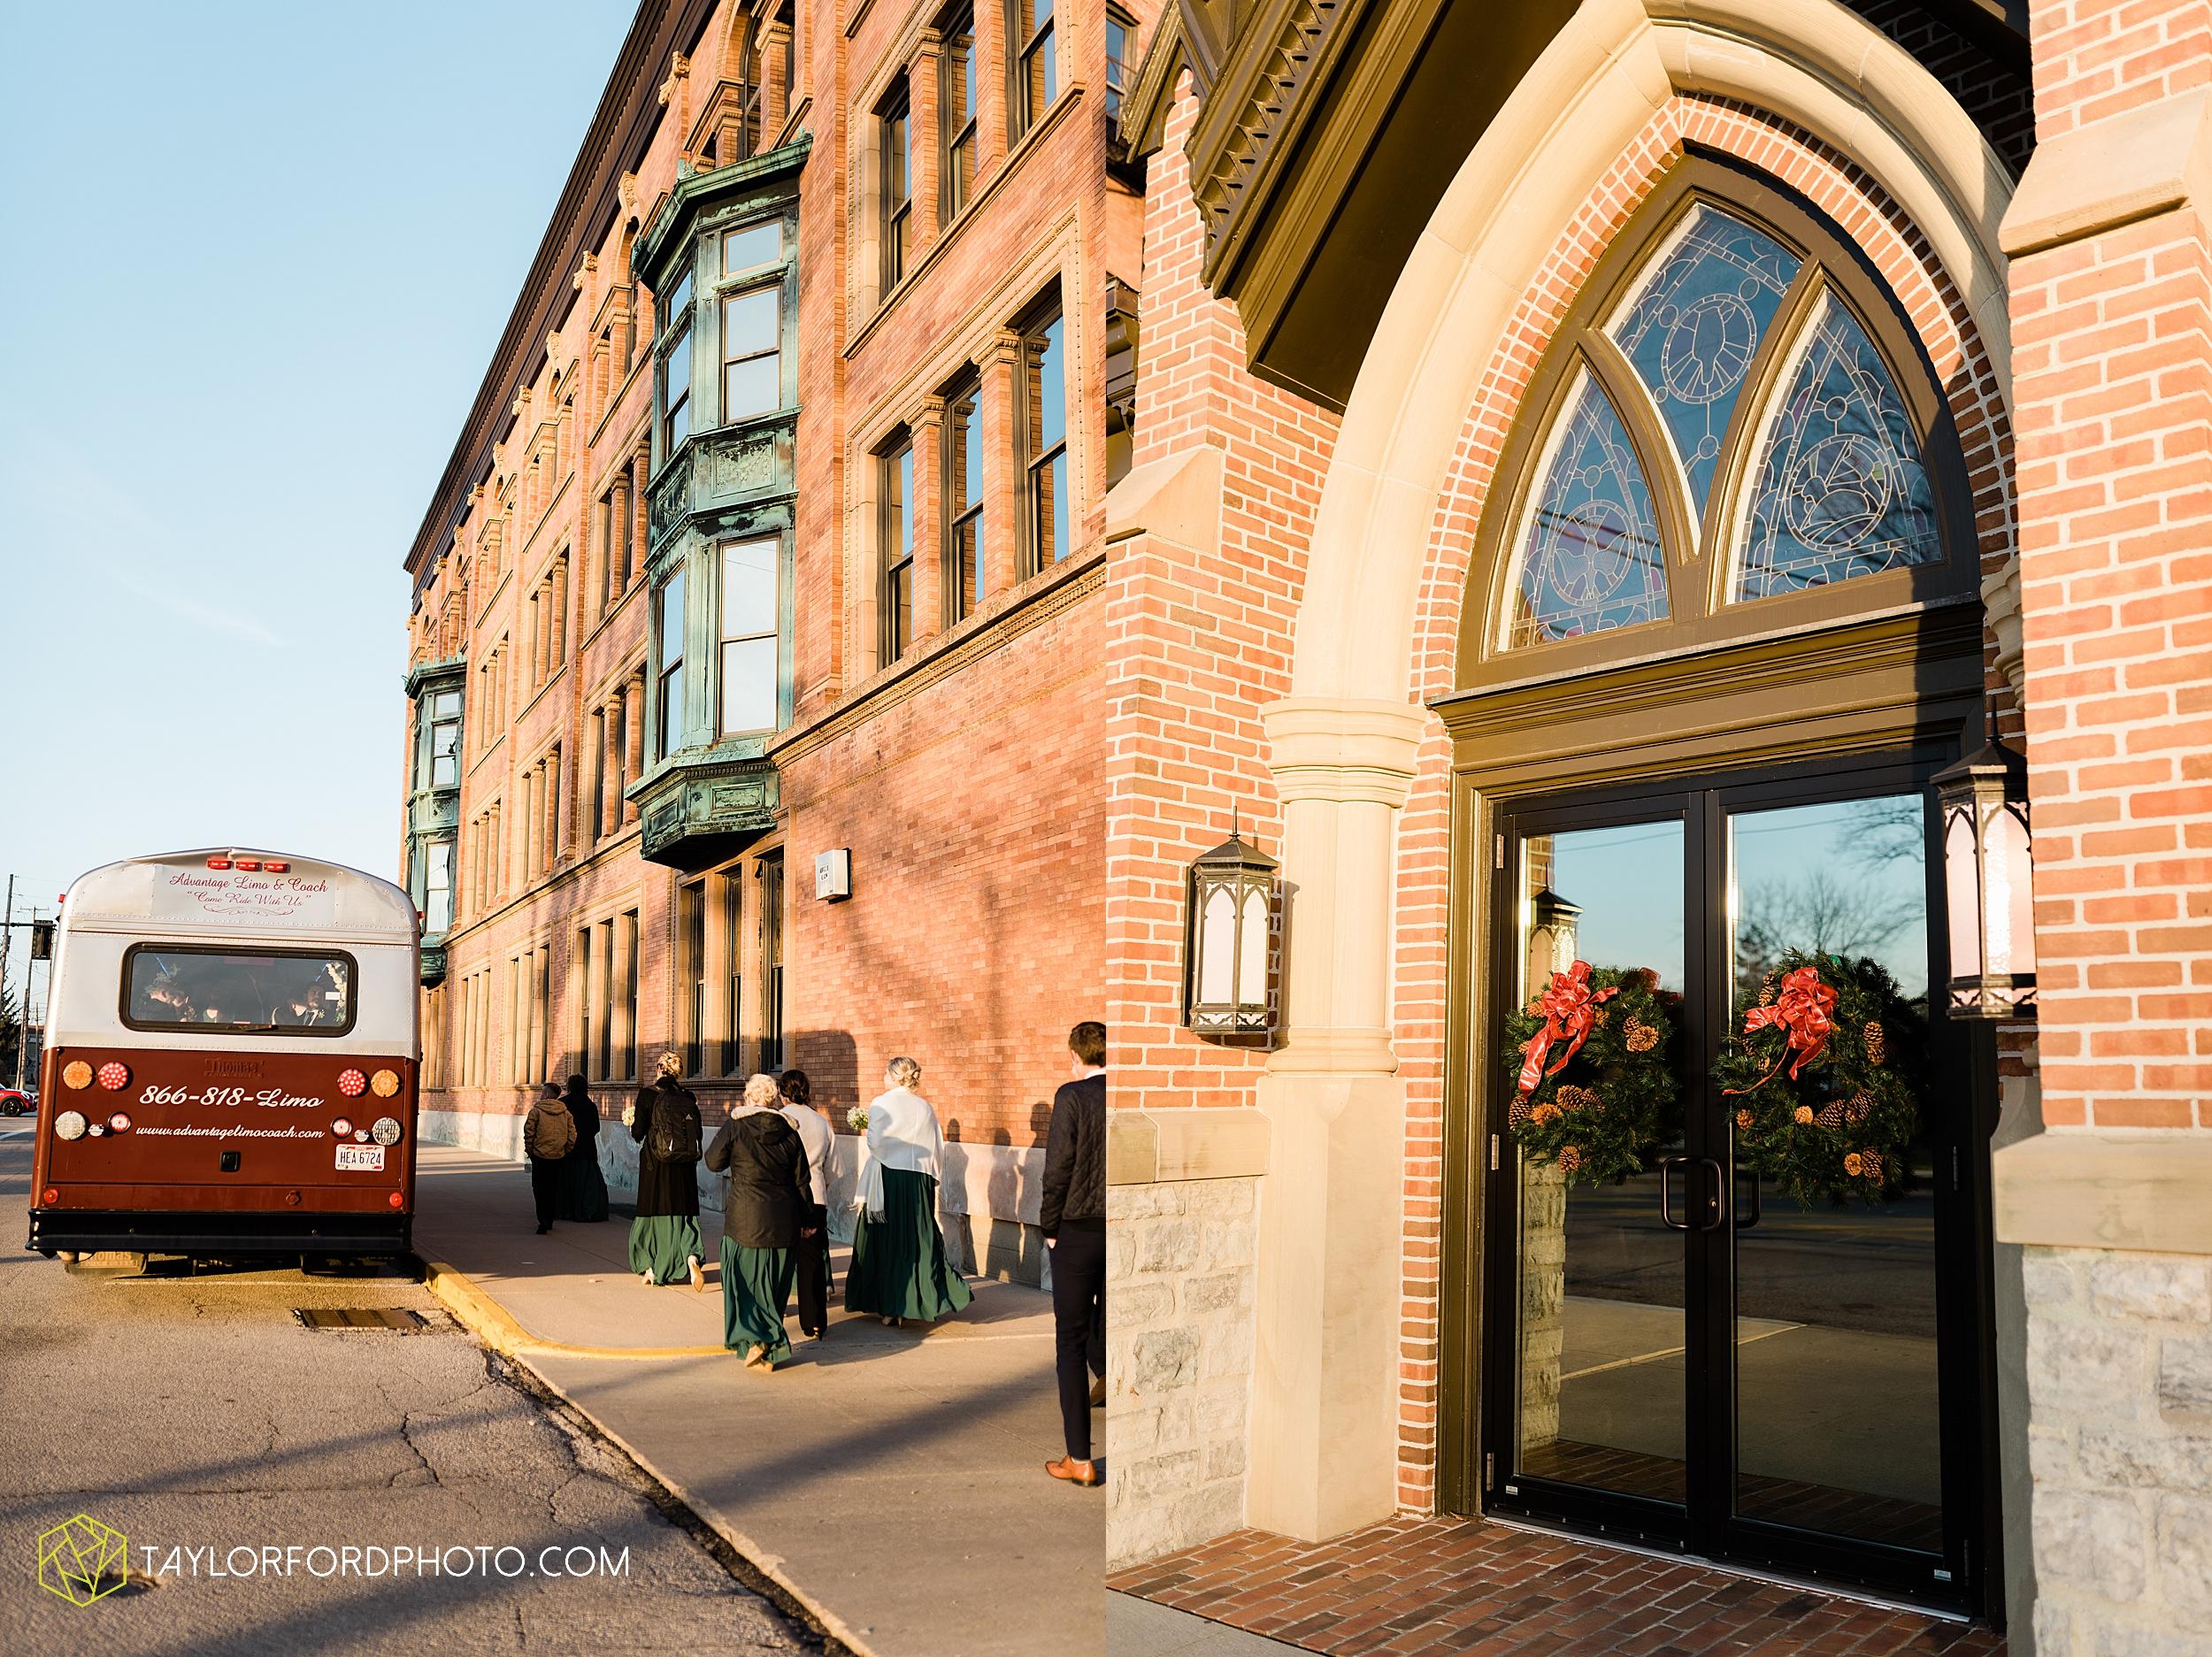 van-wert-ohio-first-united-methodist-downtown-van-wert-county-jr-fair-building-reception-winter-christmas-wedding-photographer-taylor-ford-hirschy-photographer-taylor-ford-hirschy-photographer_1924.jpg